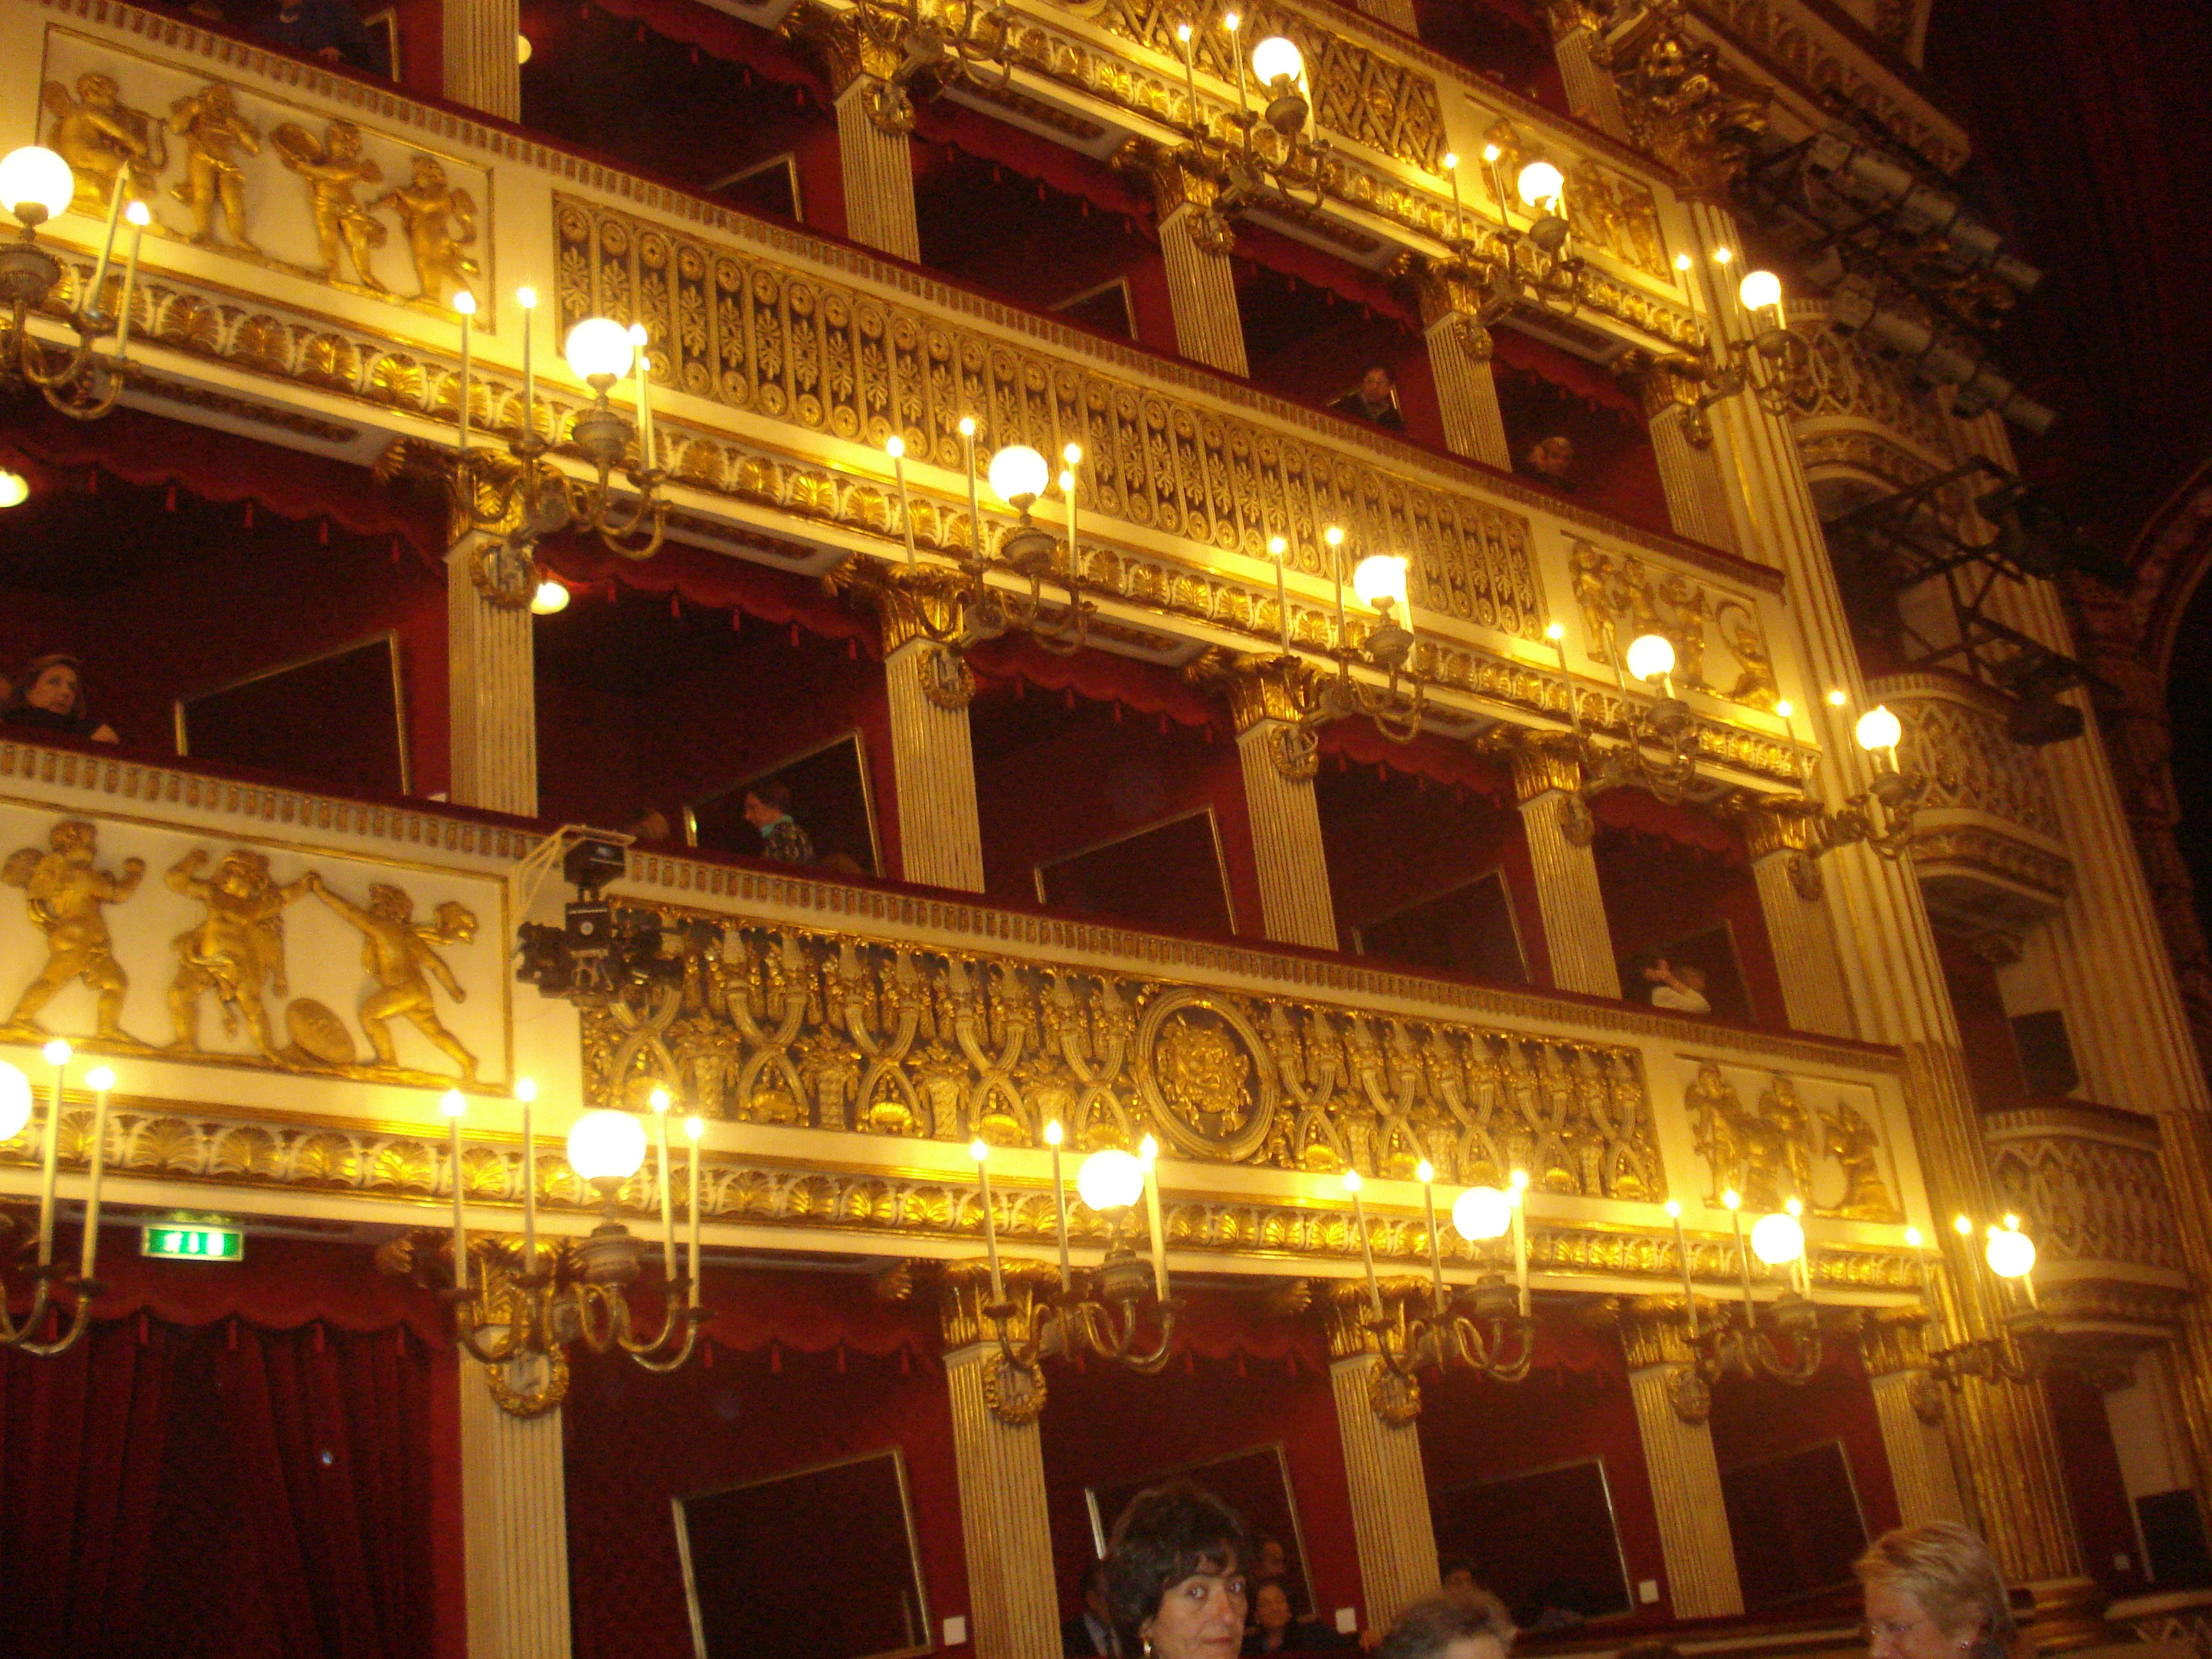 San Carlo tra Ravel, Liszt e Chopin